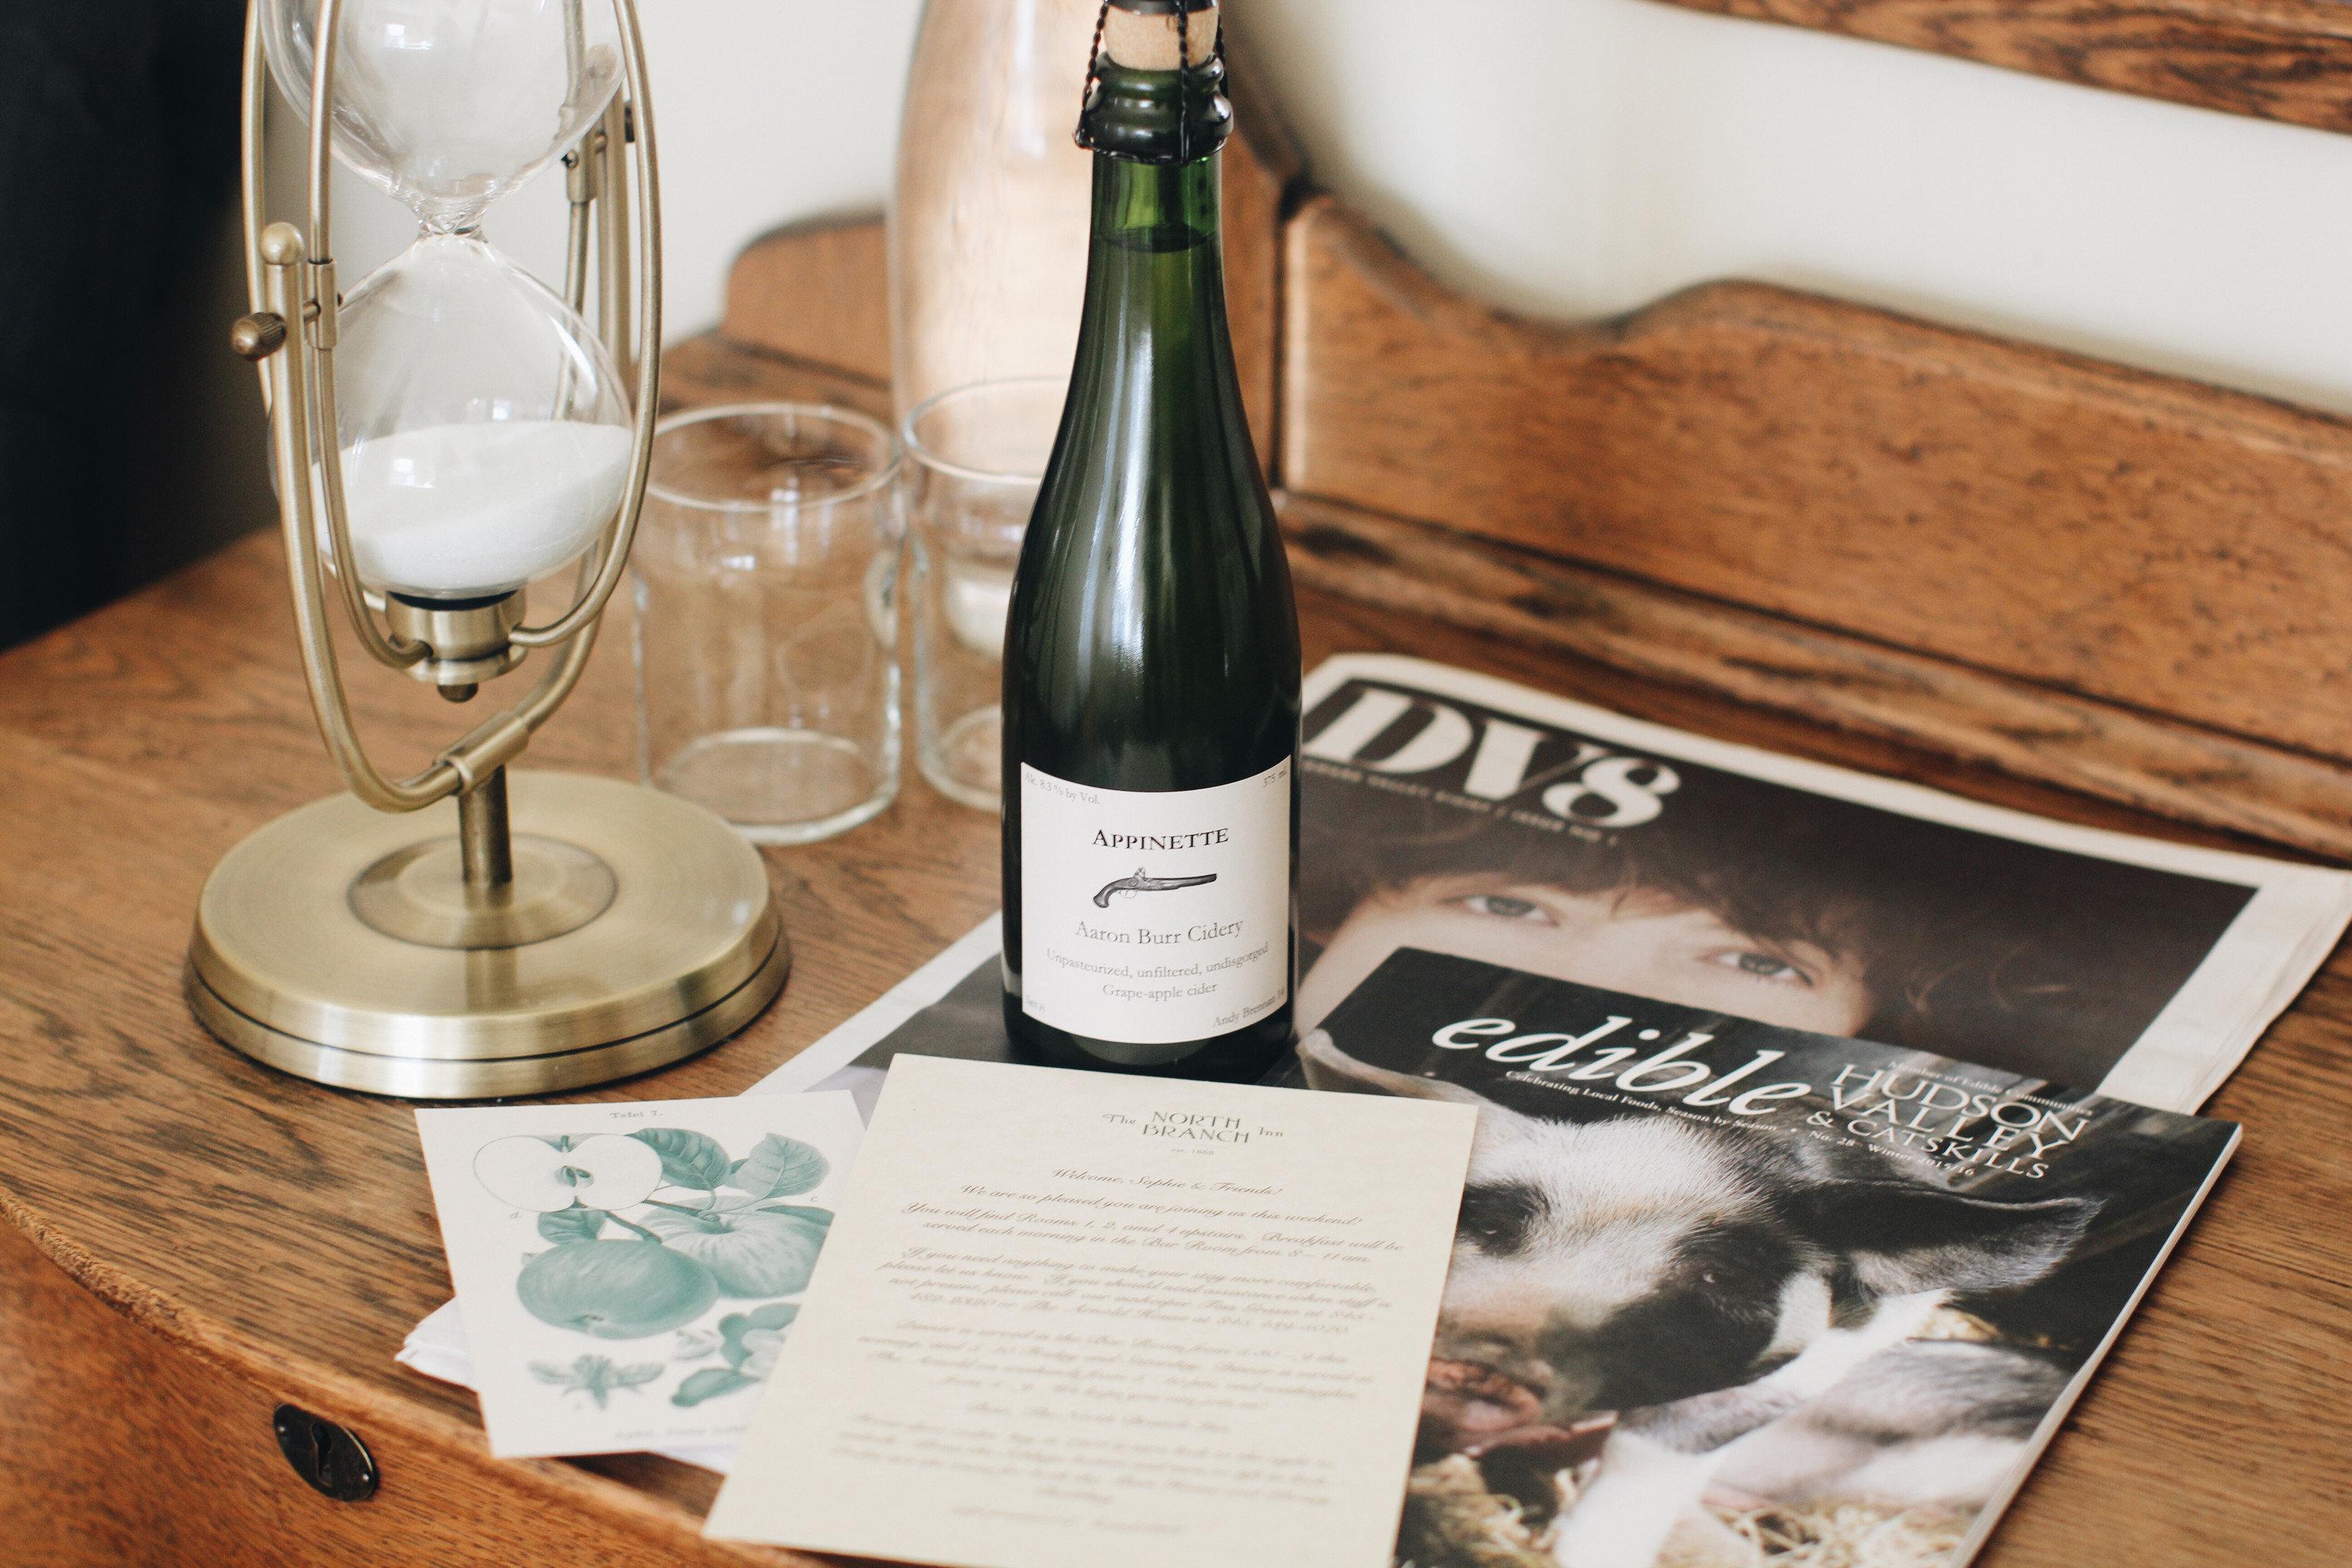 wine Drink alcoholic beverage wine bottle champagne brand